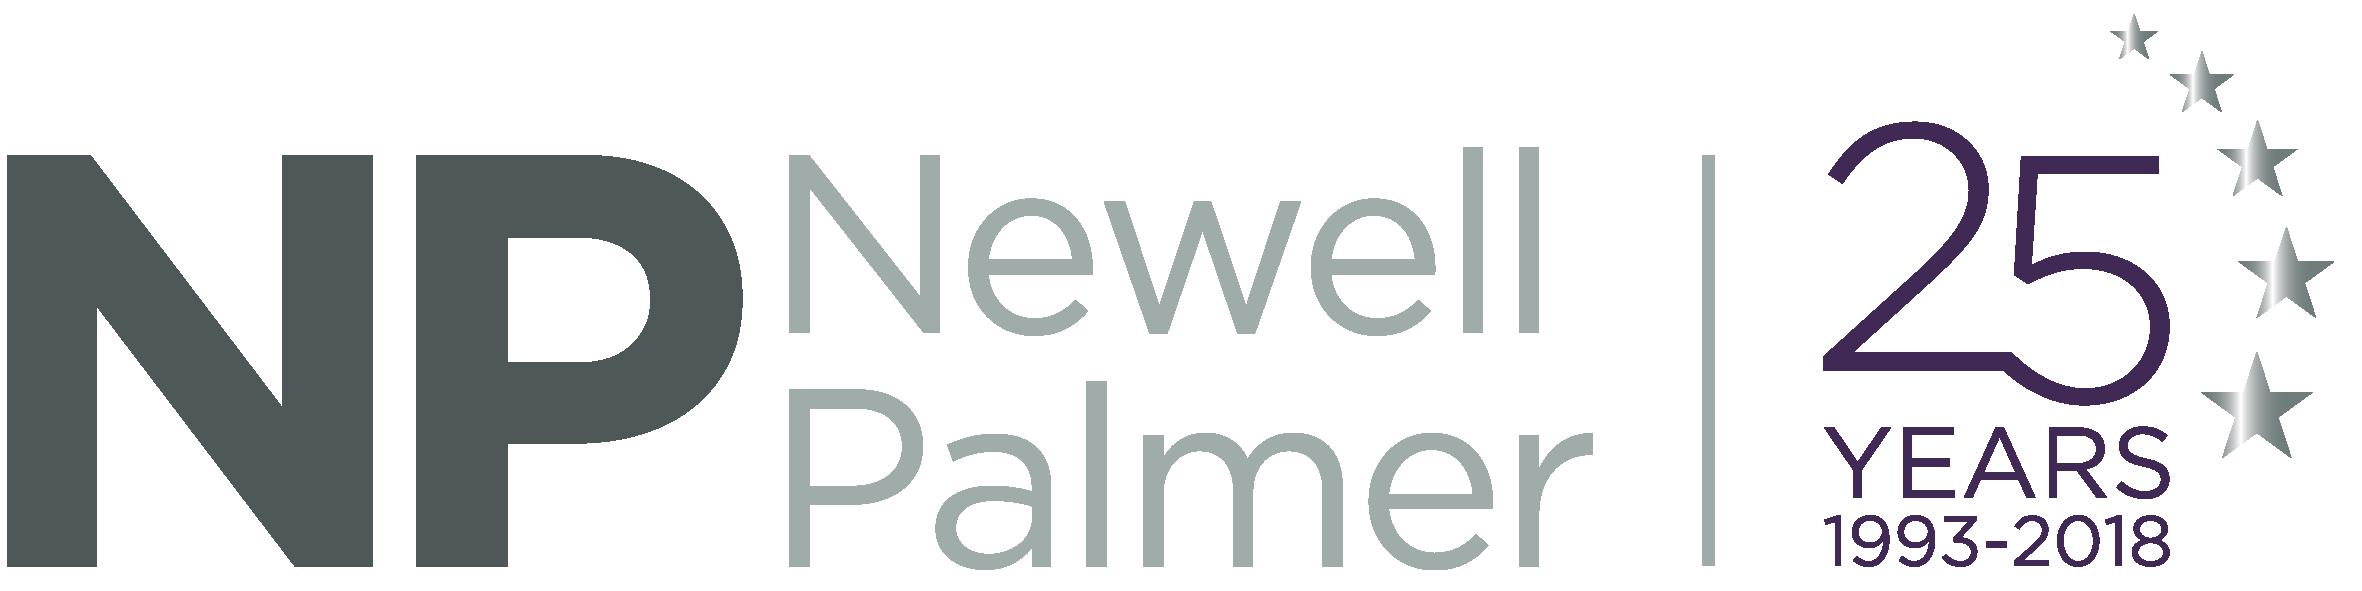 Newell Palmer